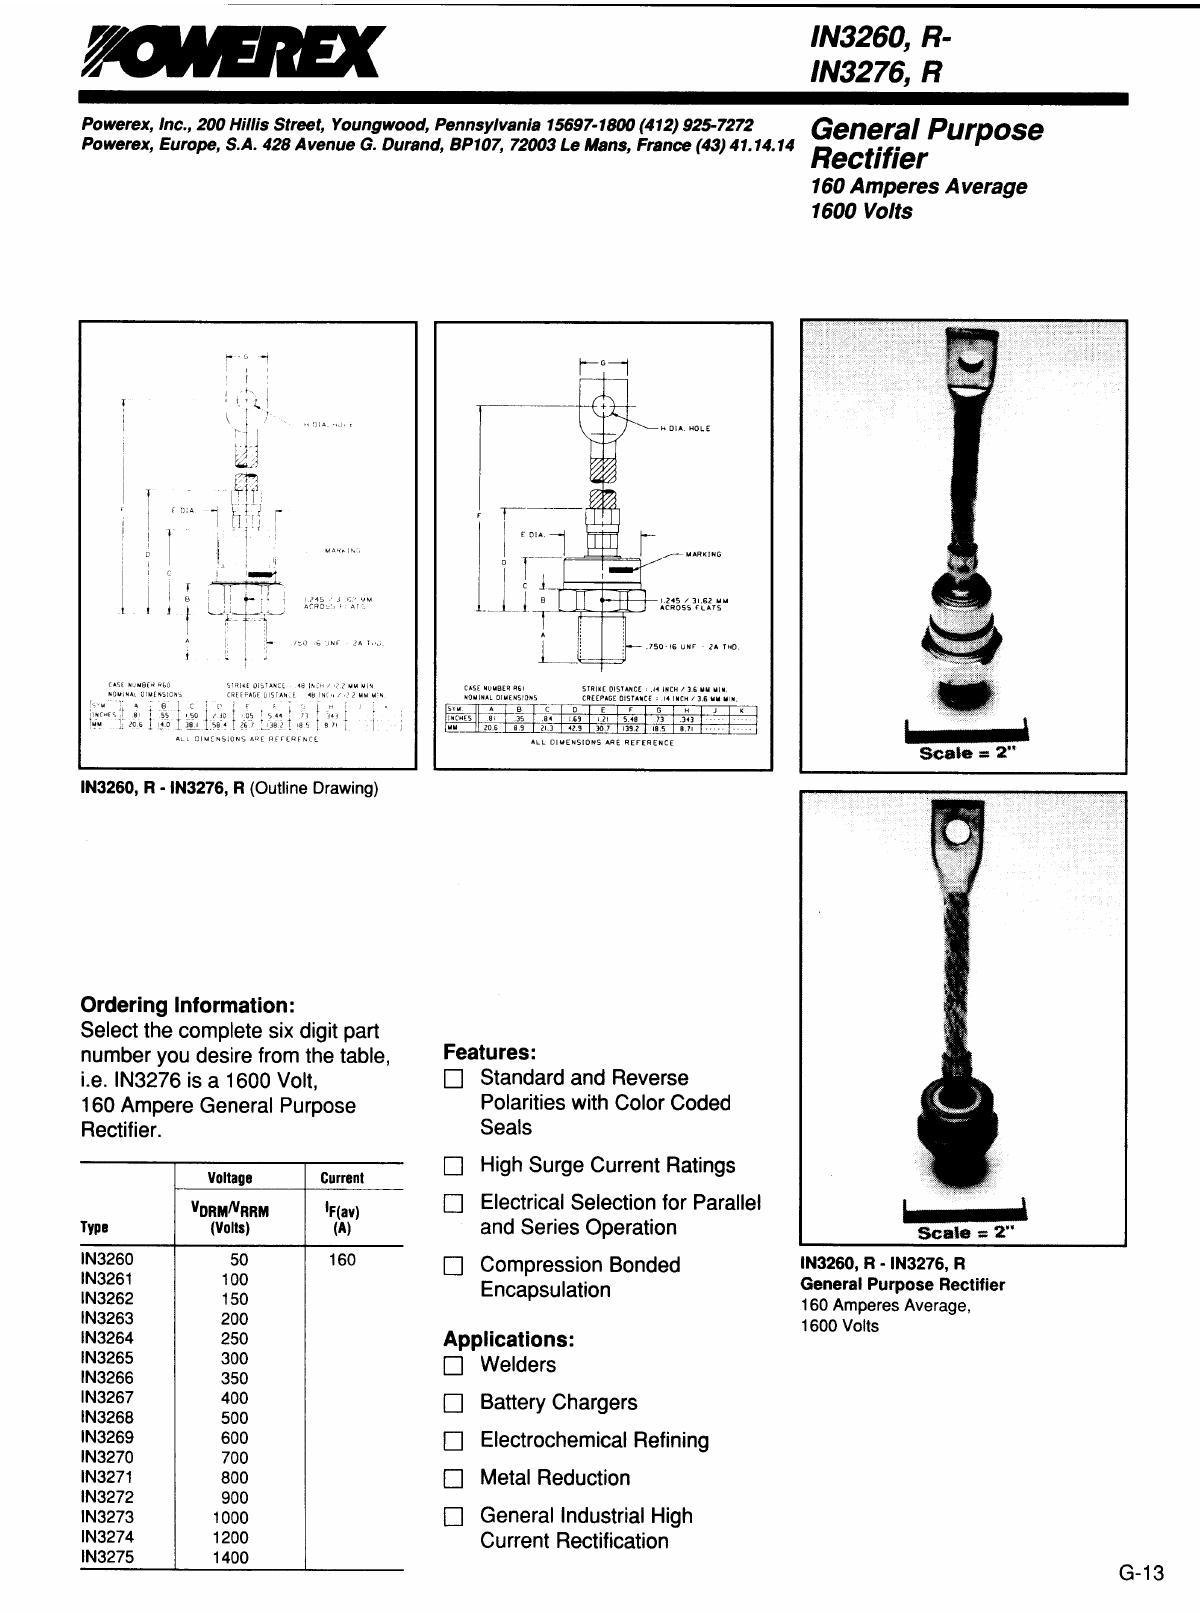 R-IN3267 datasheet